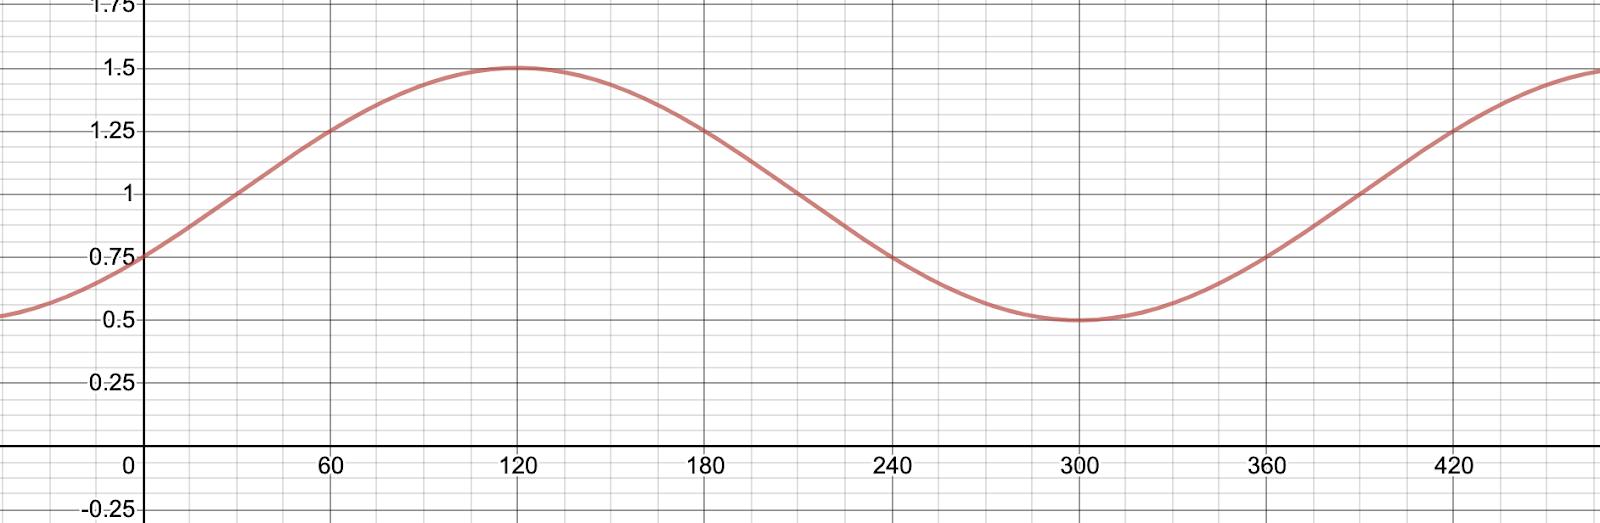 Sketch of sine wave as seen on desmos